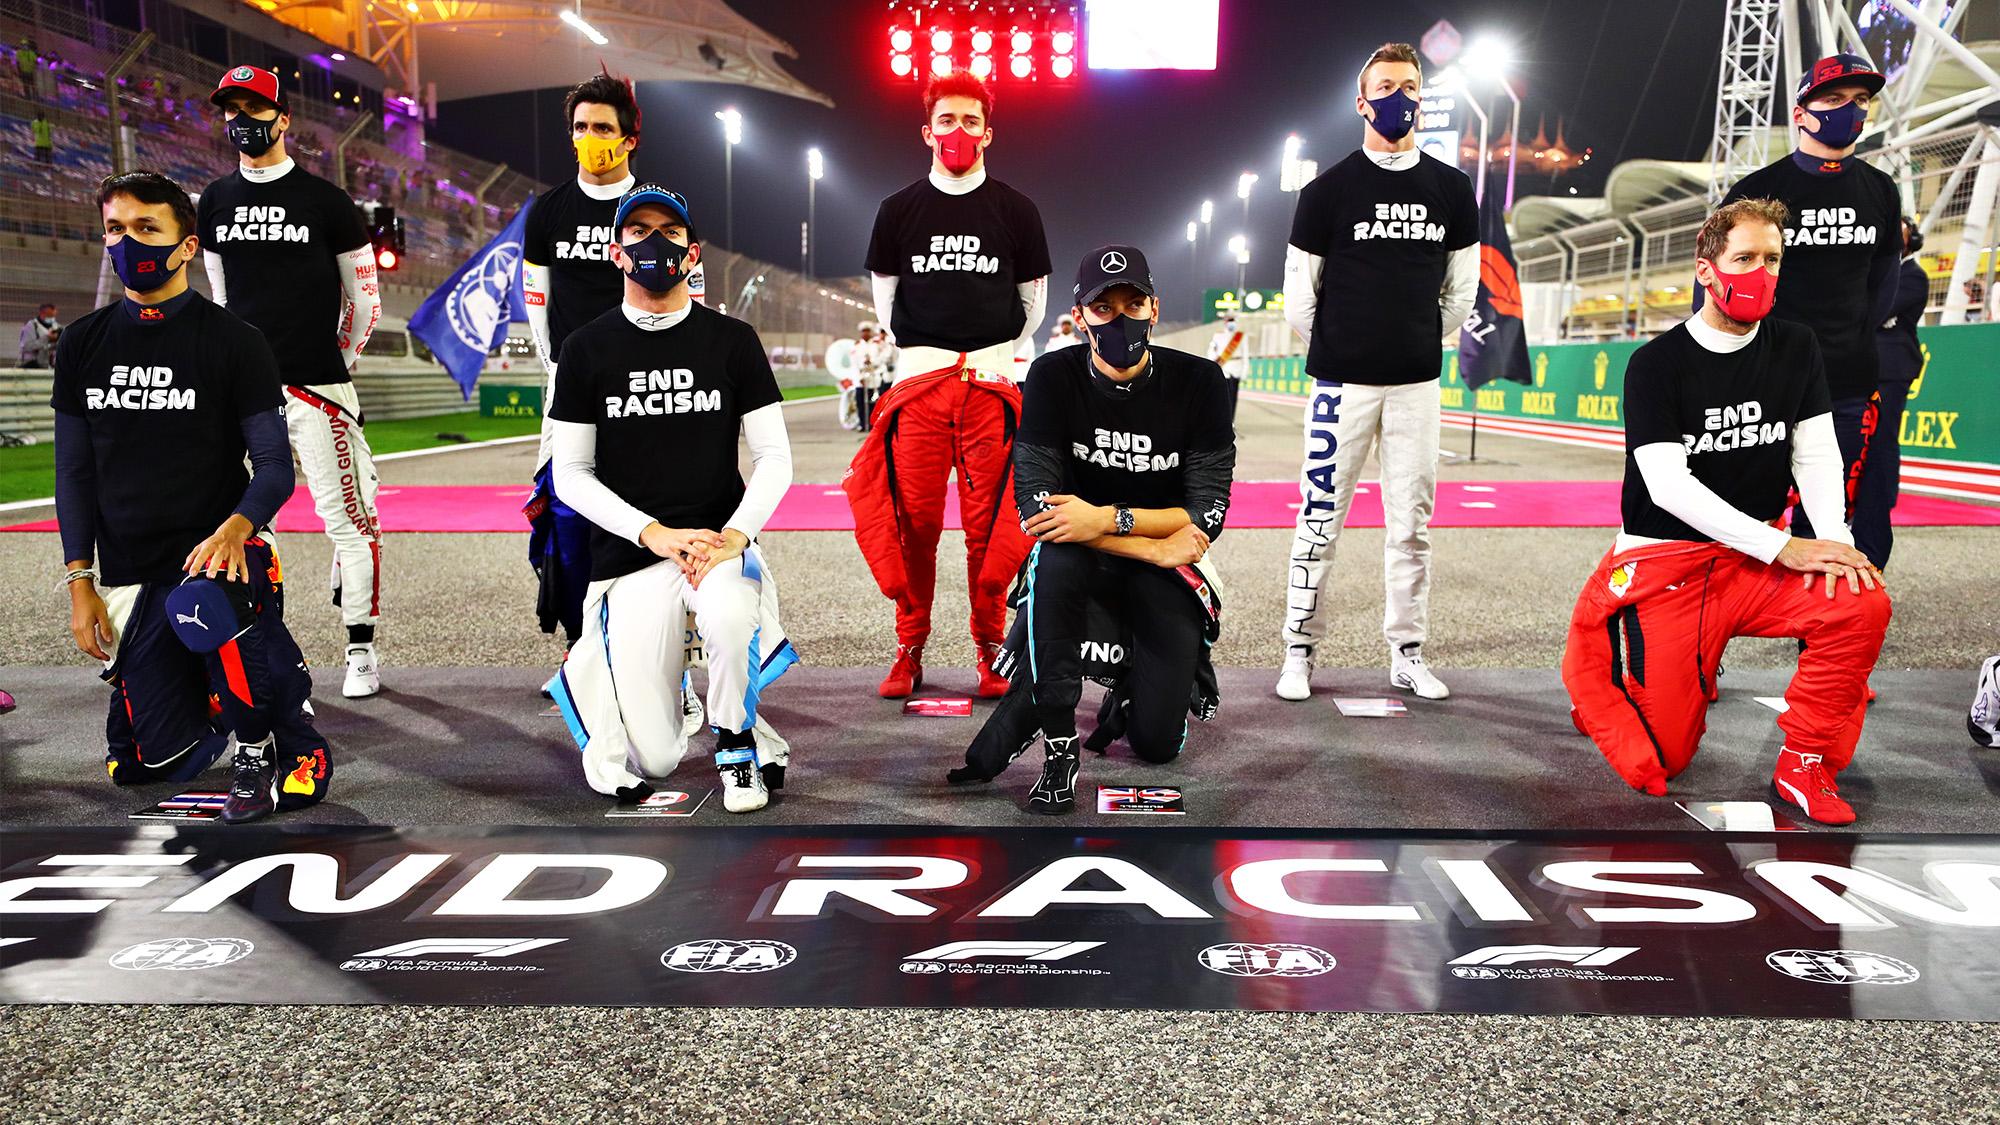 F1 drivers kneel in an anti-racism gesture ahead of the 2020 Bahrain Grand Prix